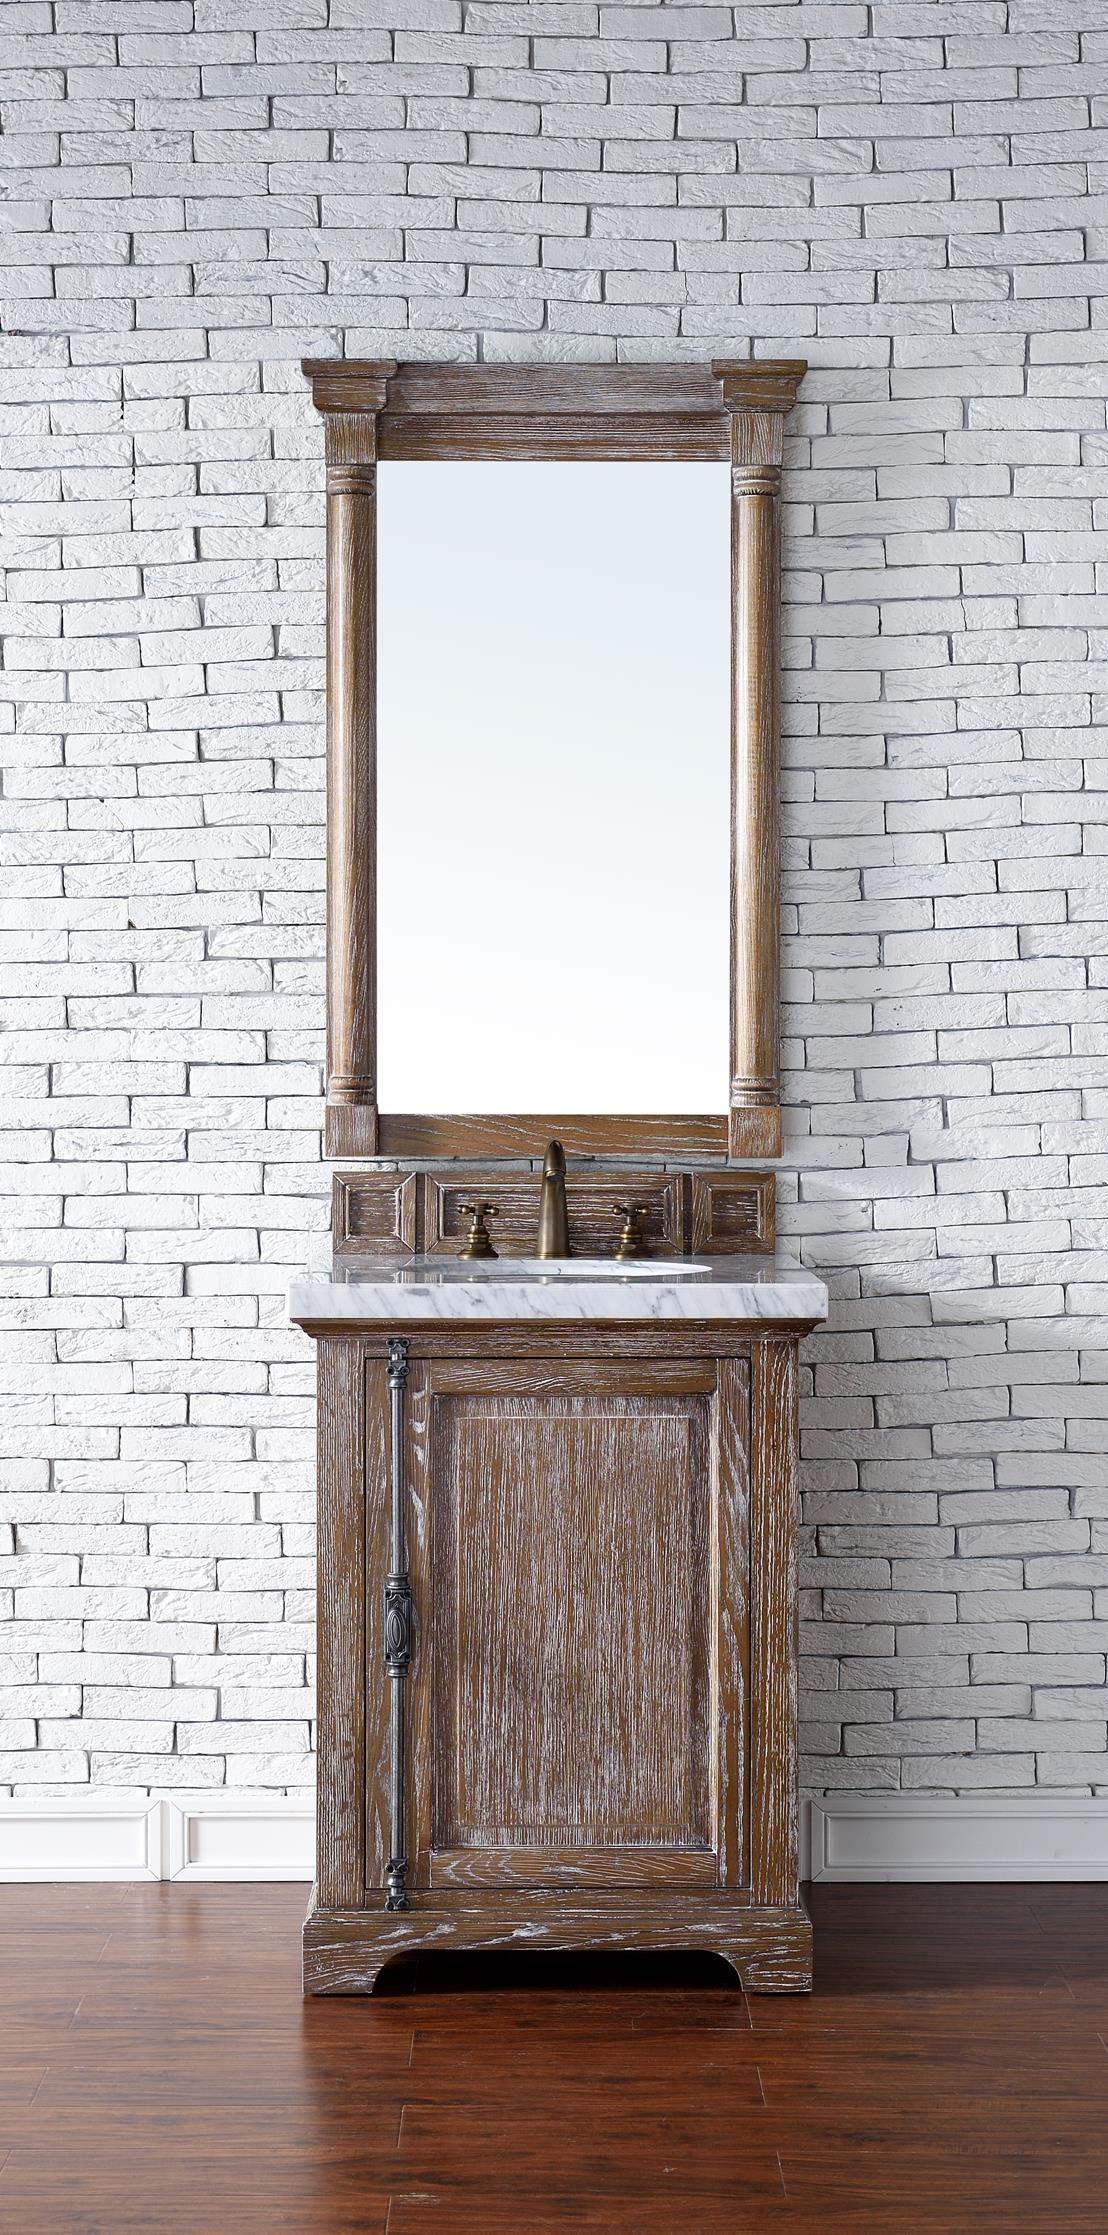 Providence 26 Single Sink Bathroom Vanity Cabinet Driftwood Finish Carrara White Marble Co James Martin Furniture Single Vanity Bathroom Decor Accessories